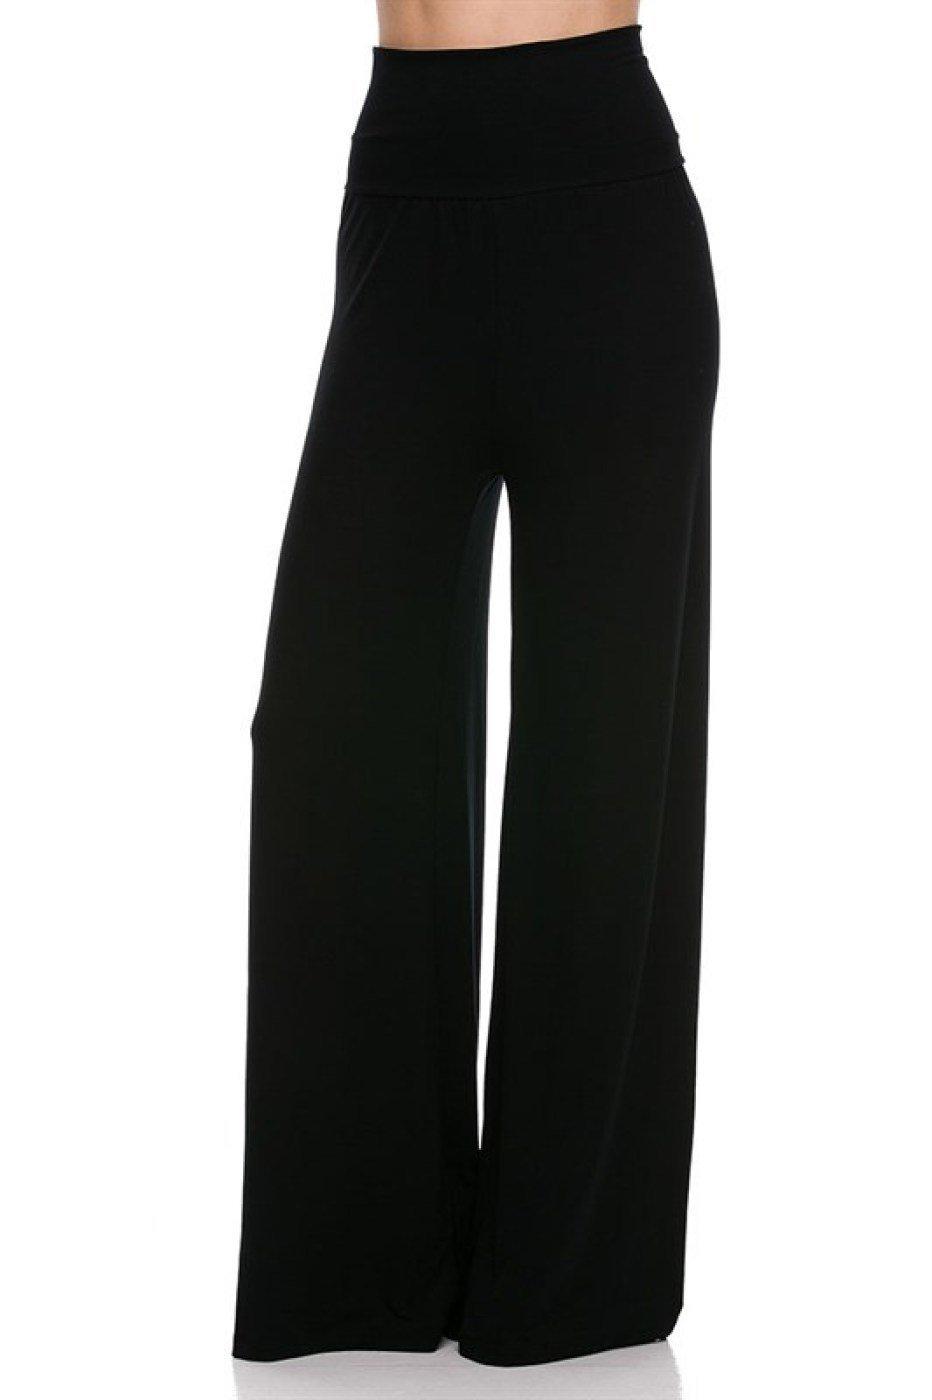 Trendyfriday Women's High Waisted Plazzo Pants S, BLACK